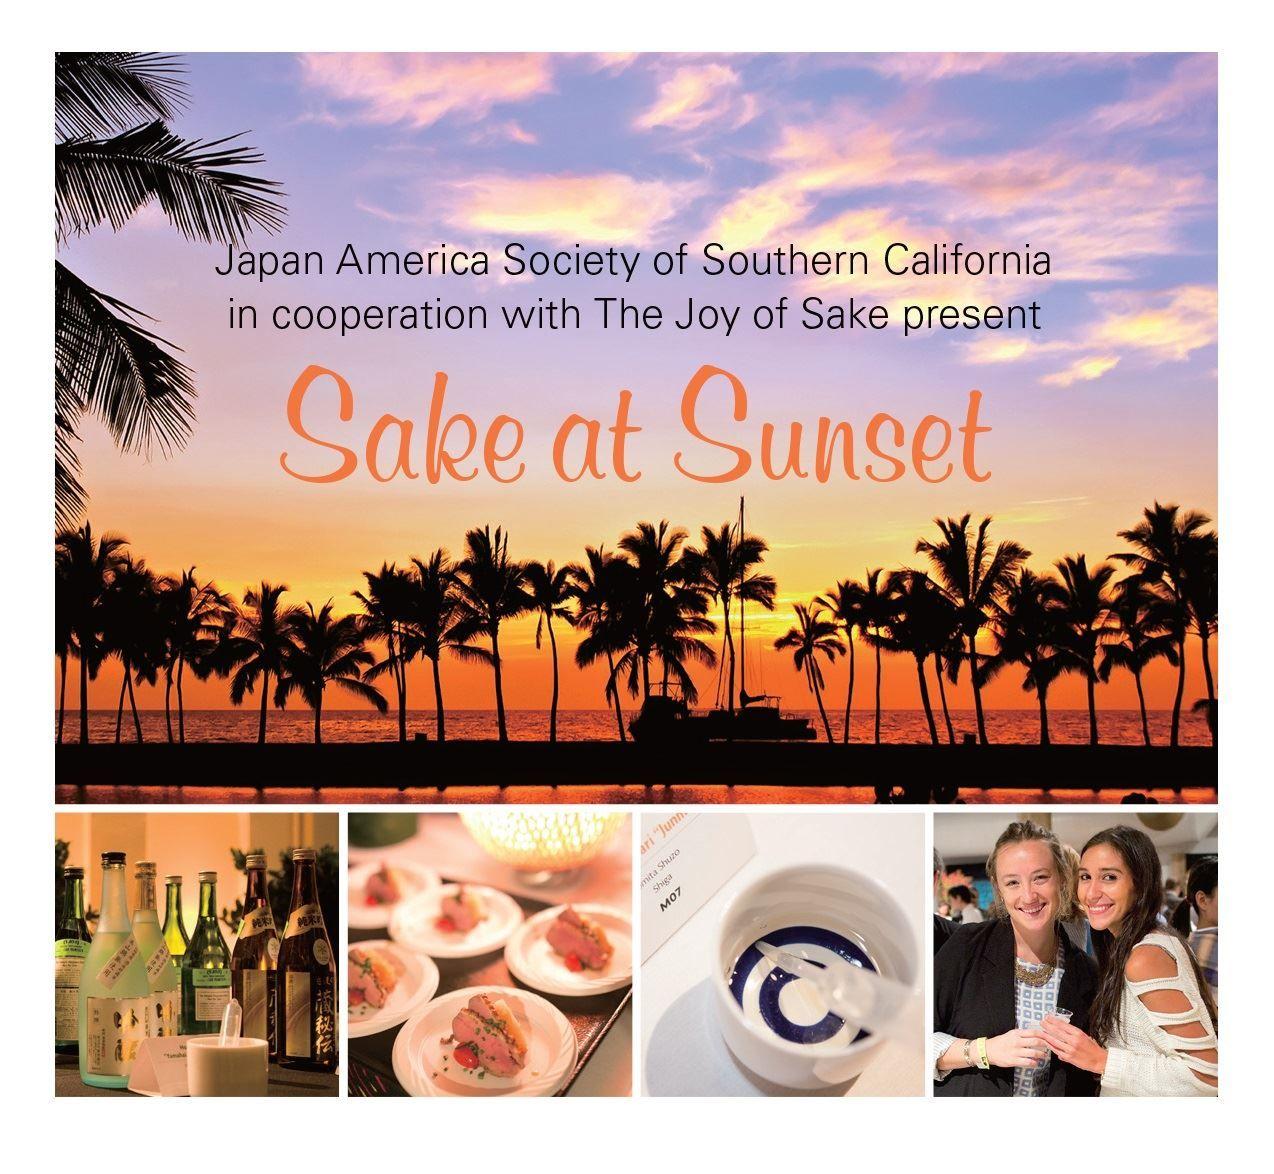 Japan America Society of Southern California - Sake at Sunset